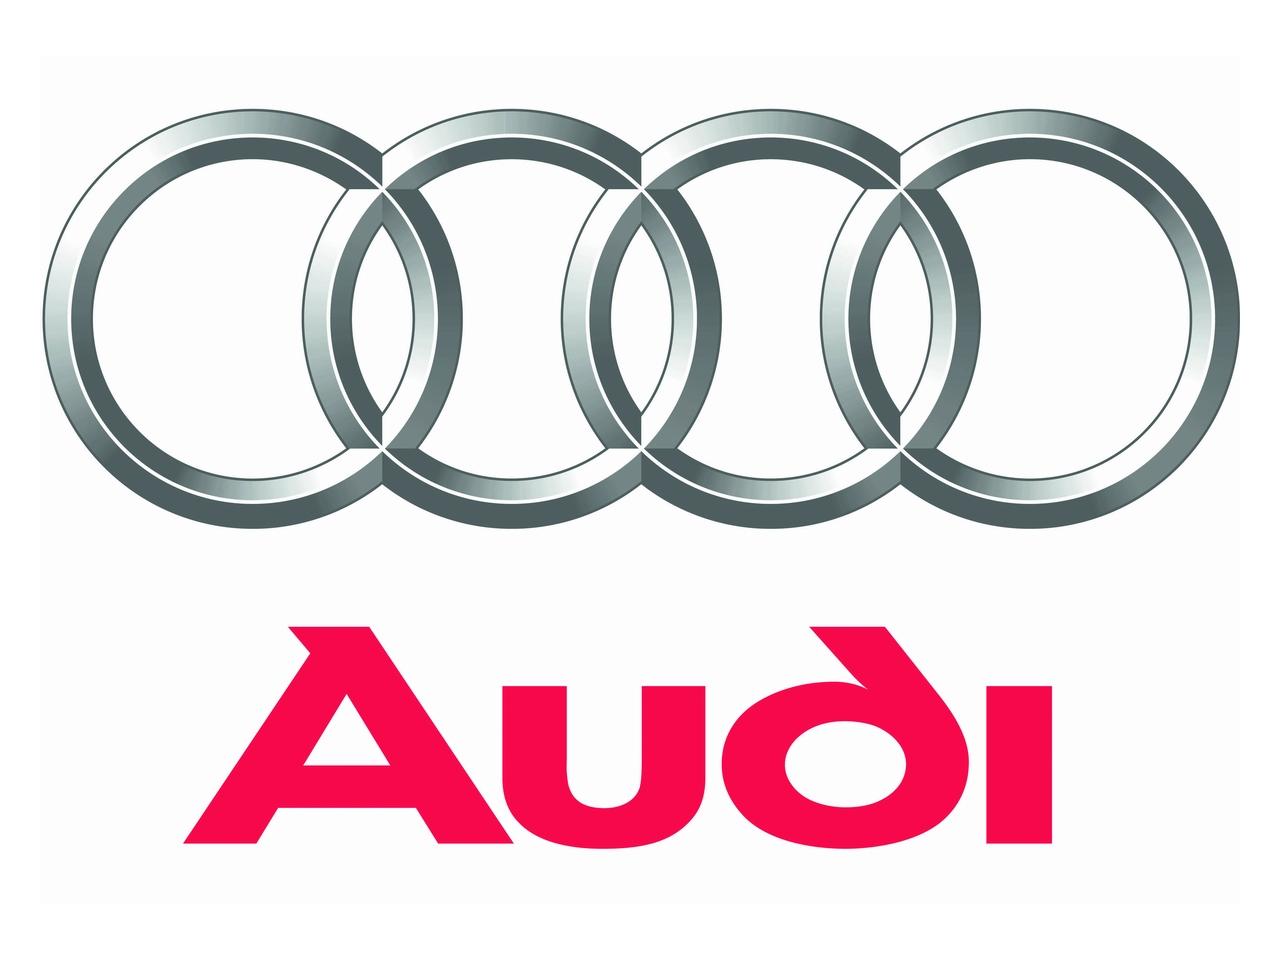 Audi Symbol -Logo Brands For Free HD 3D